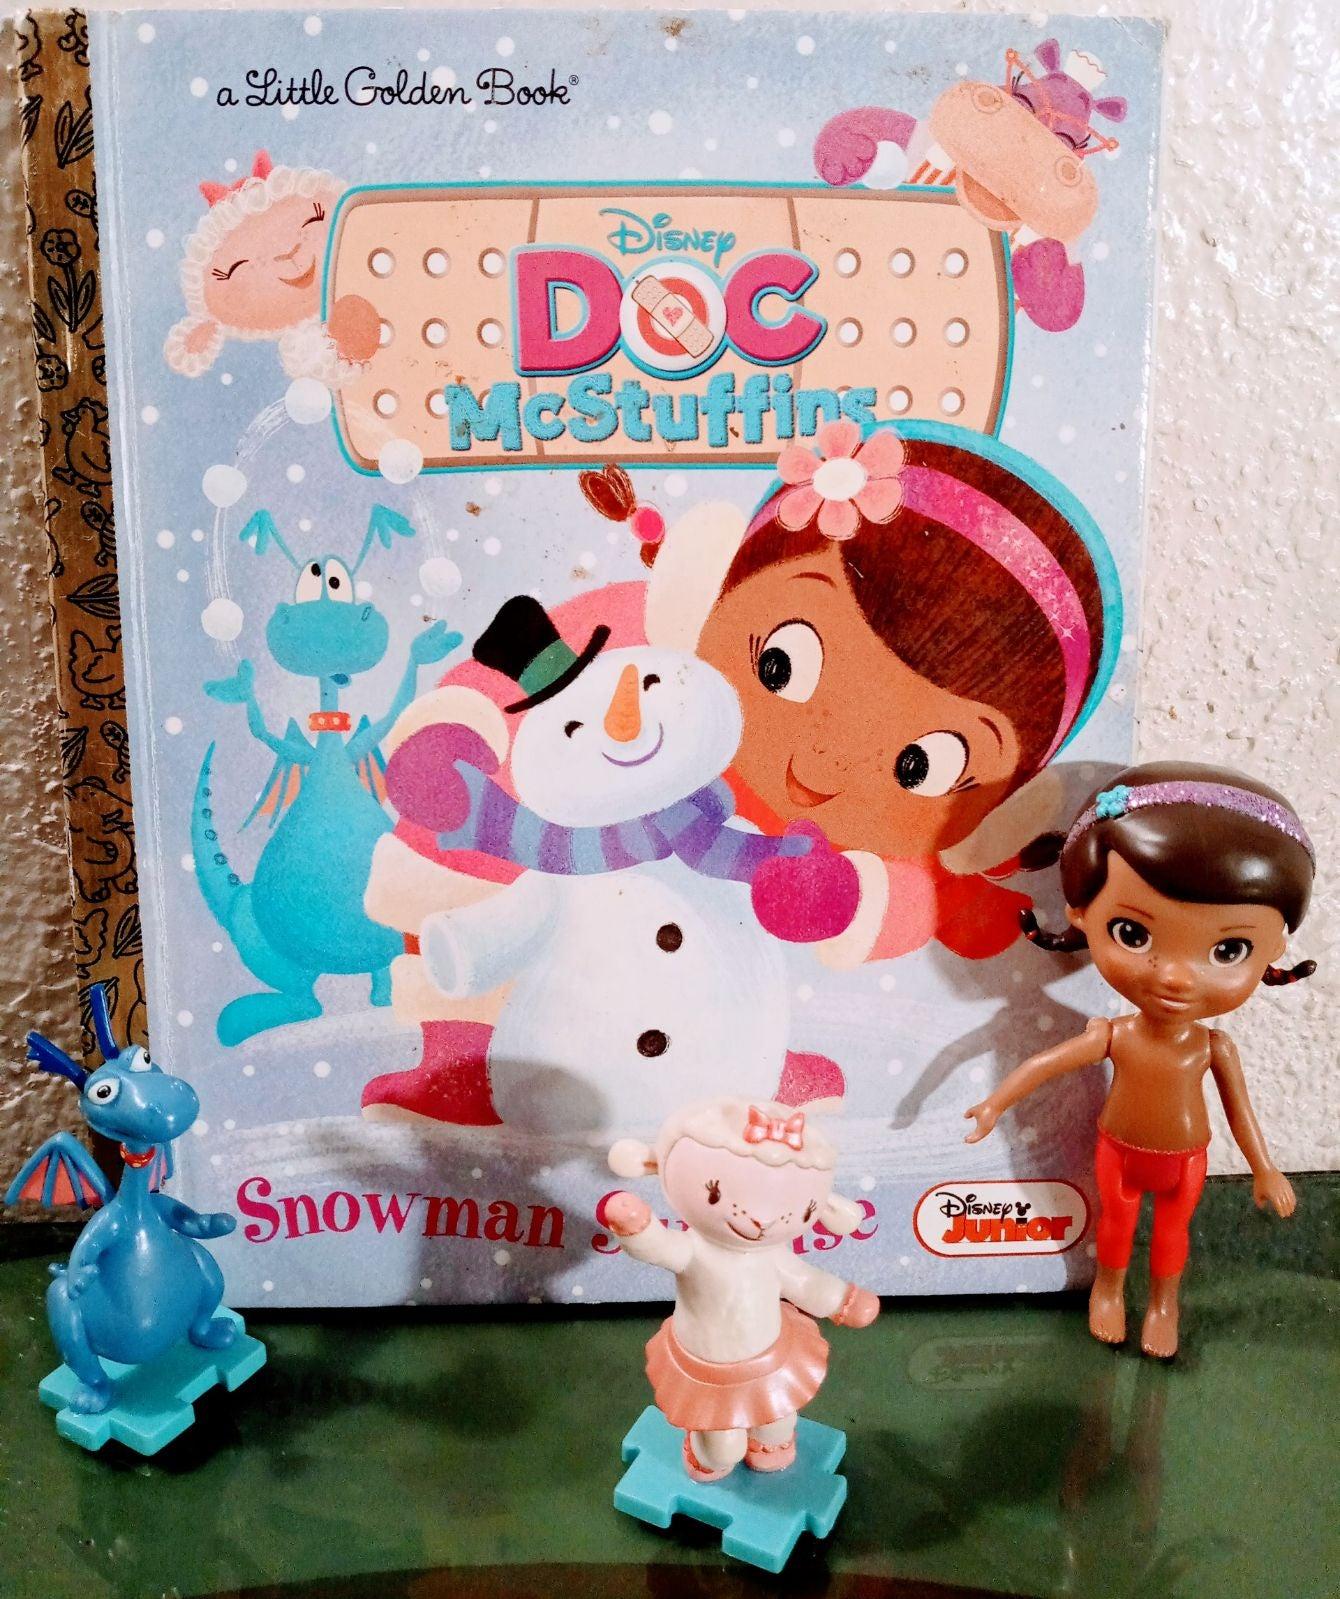 Doc Mcstuffins book & figurines